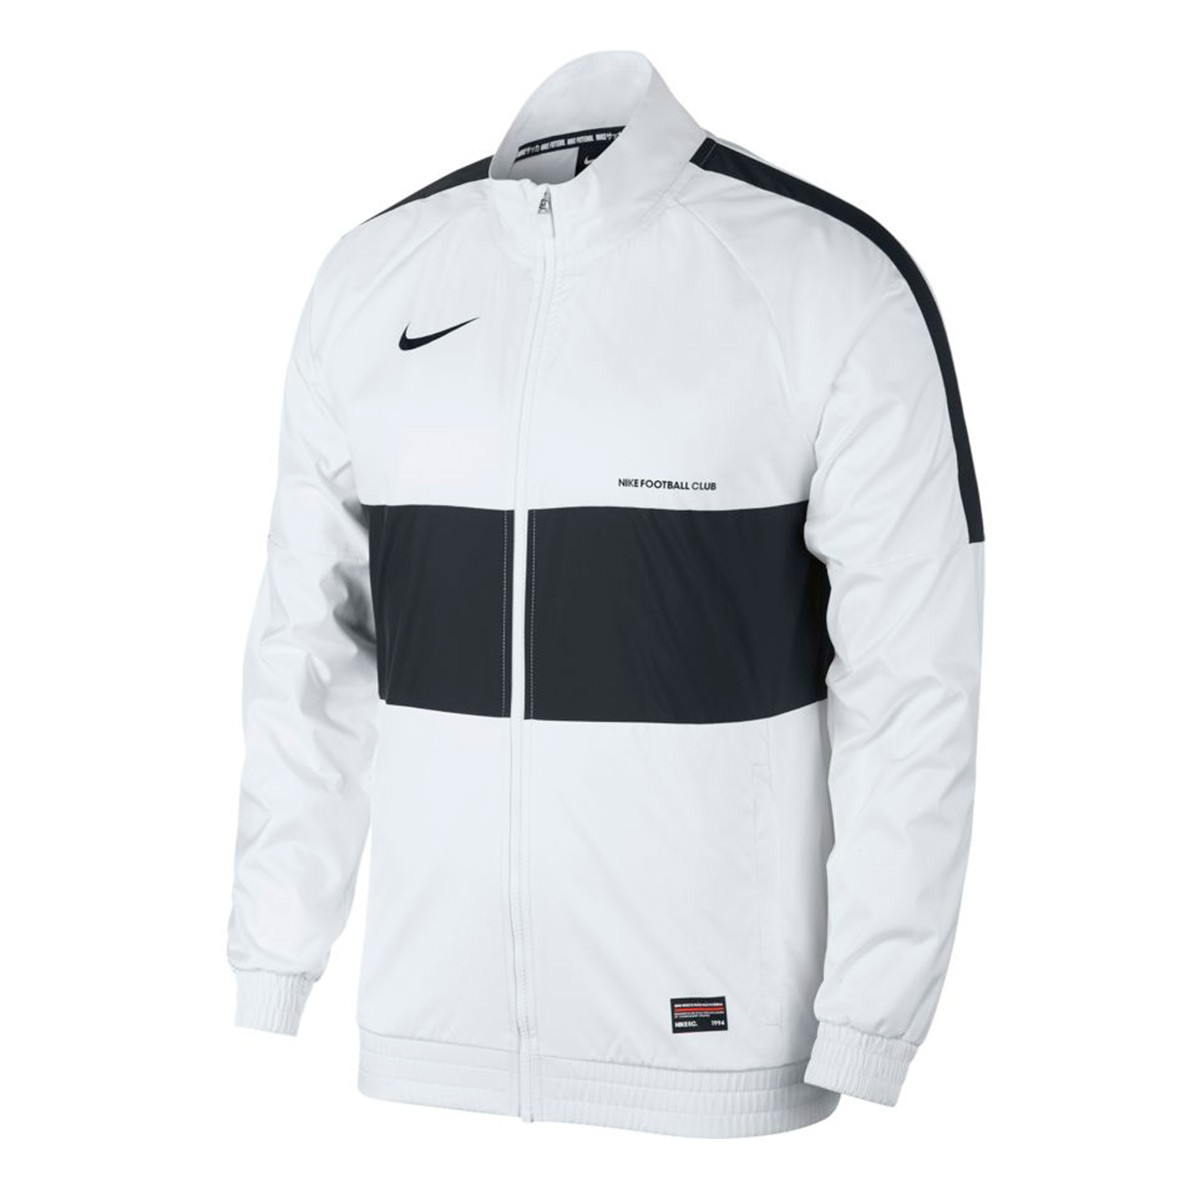 Negligencia estéreo difícil  Jacket Nike Nike F.C. White-Black - Football store Fútbol Emotion